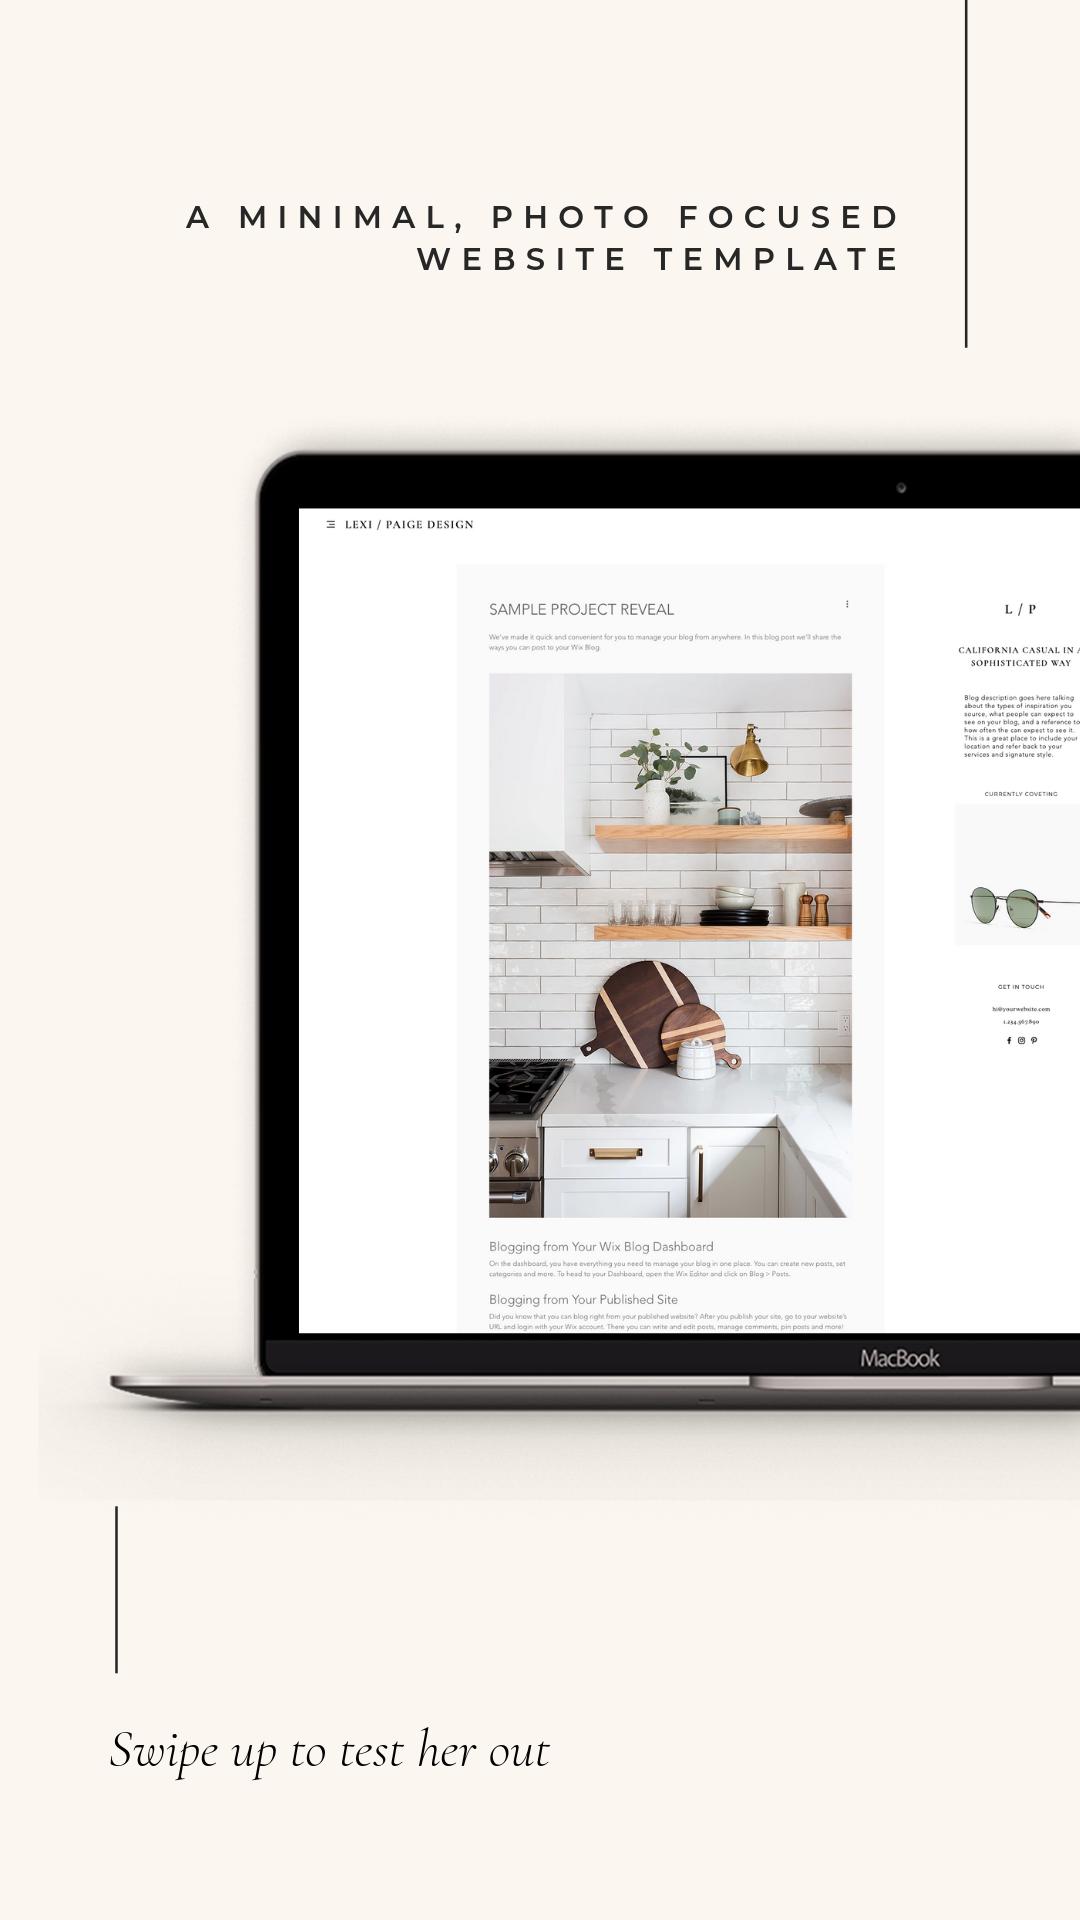 Meet The Lexi Beautiful Minimal Web Design Template For Interior Designers On Wix B Minimal Web Design Interior Design Website Templates Web Template Design